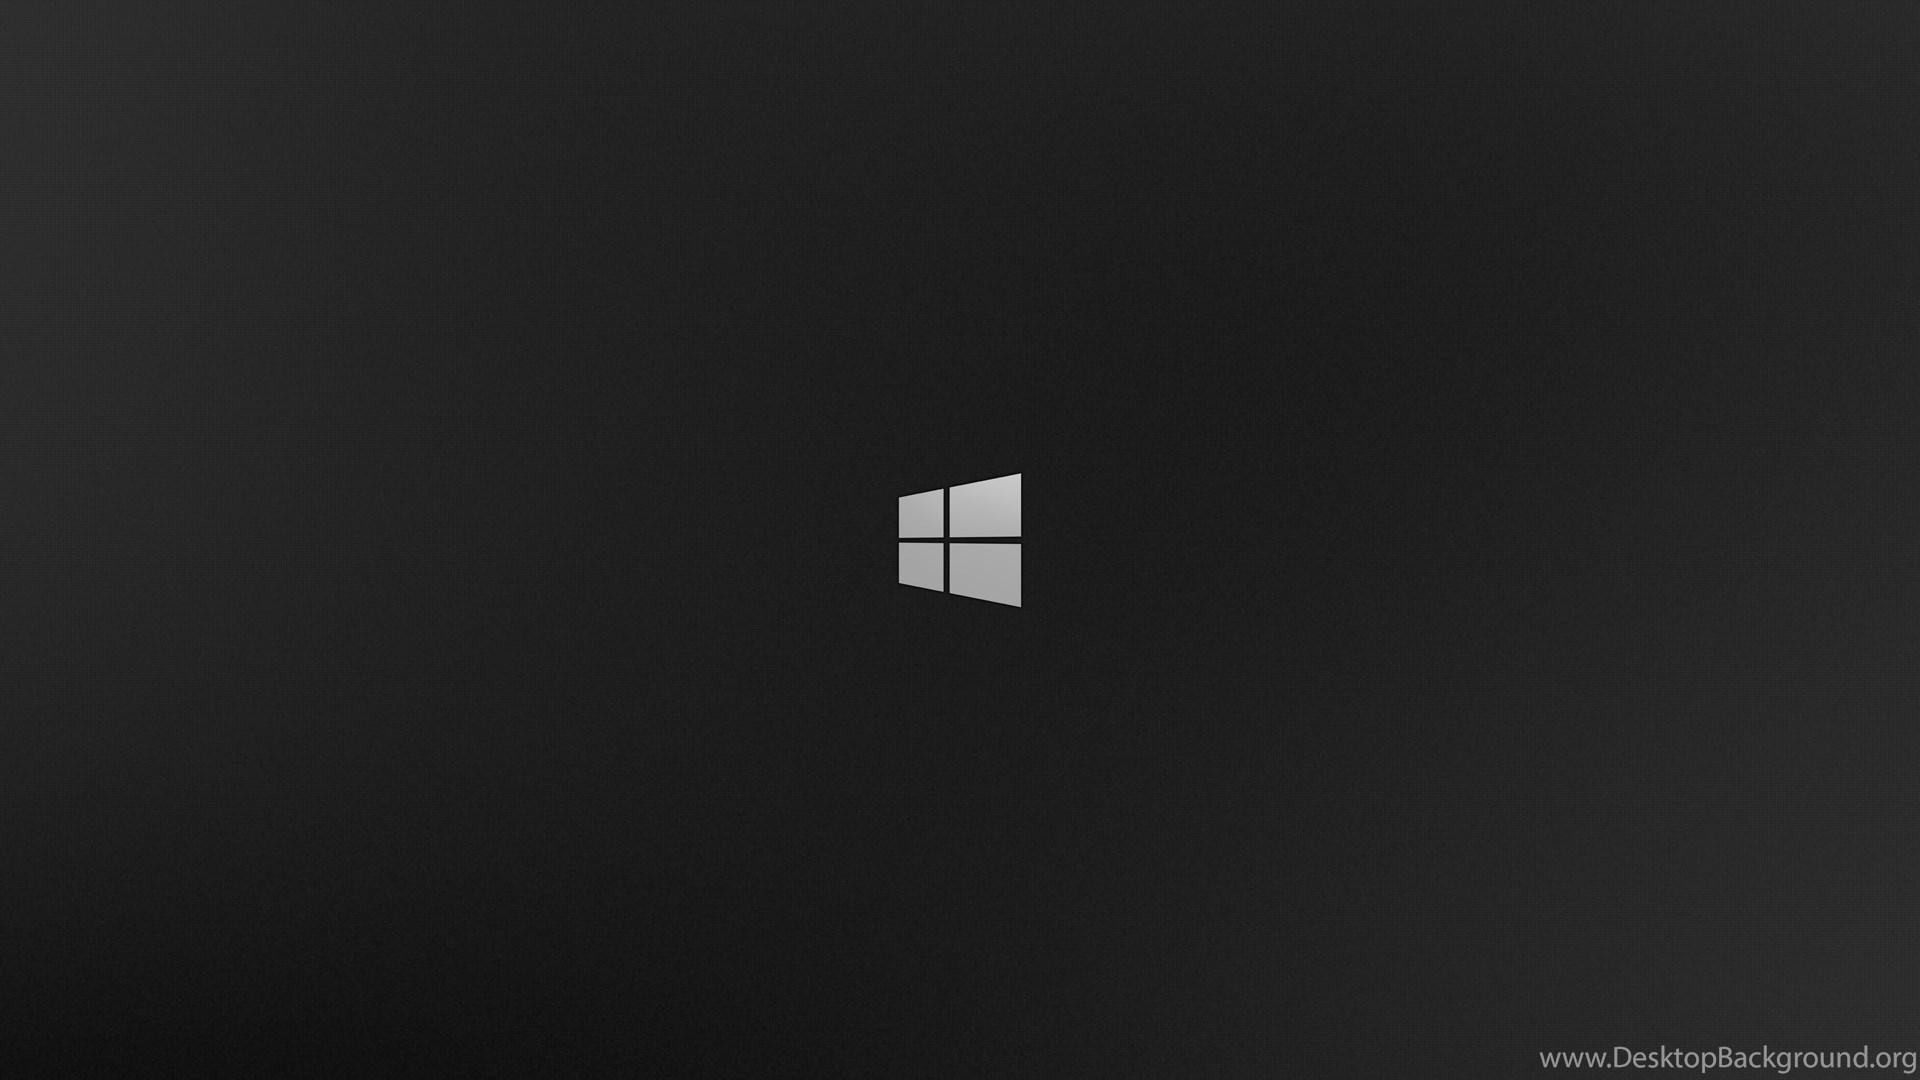 16 Luxury Pubg Wallpaper Iphone 6: Windows Black Wallpapers Desktop Background